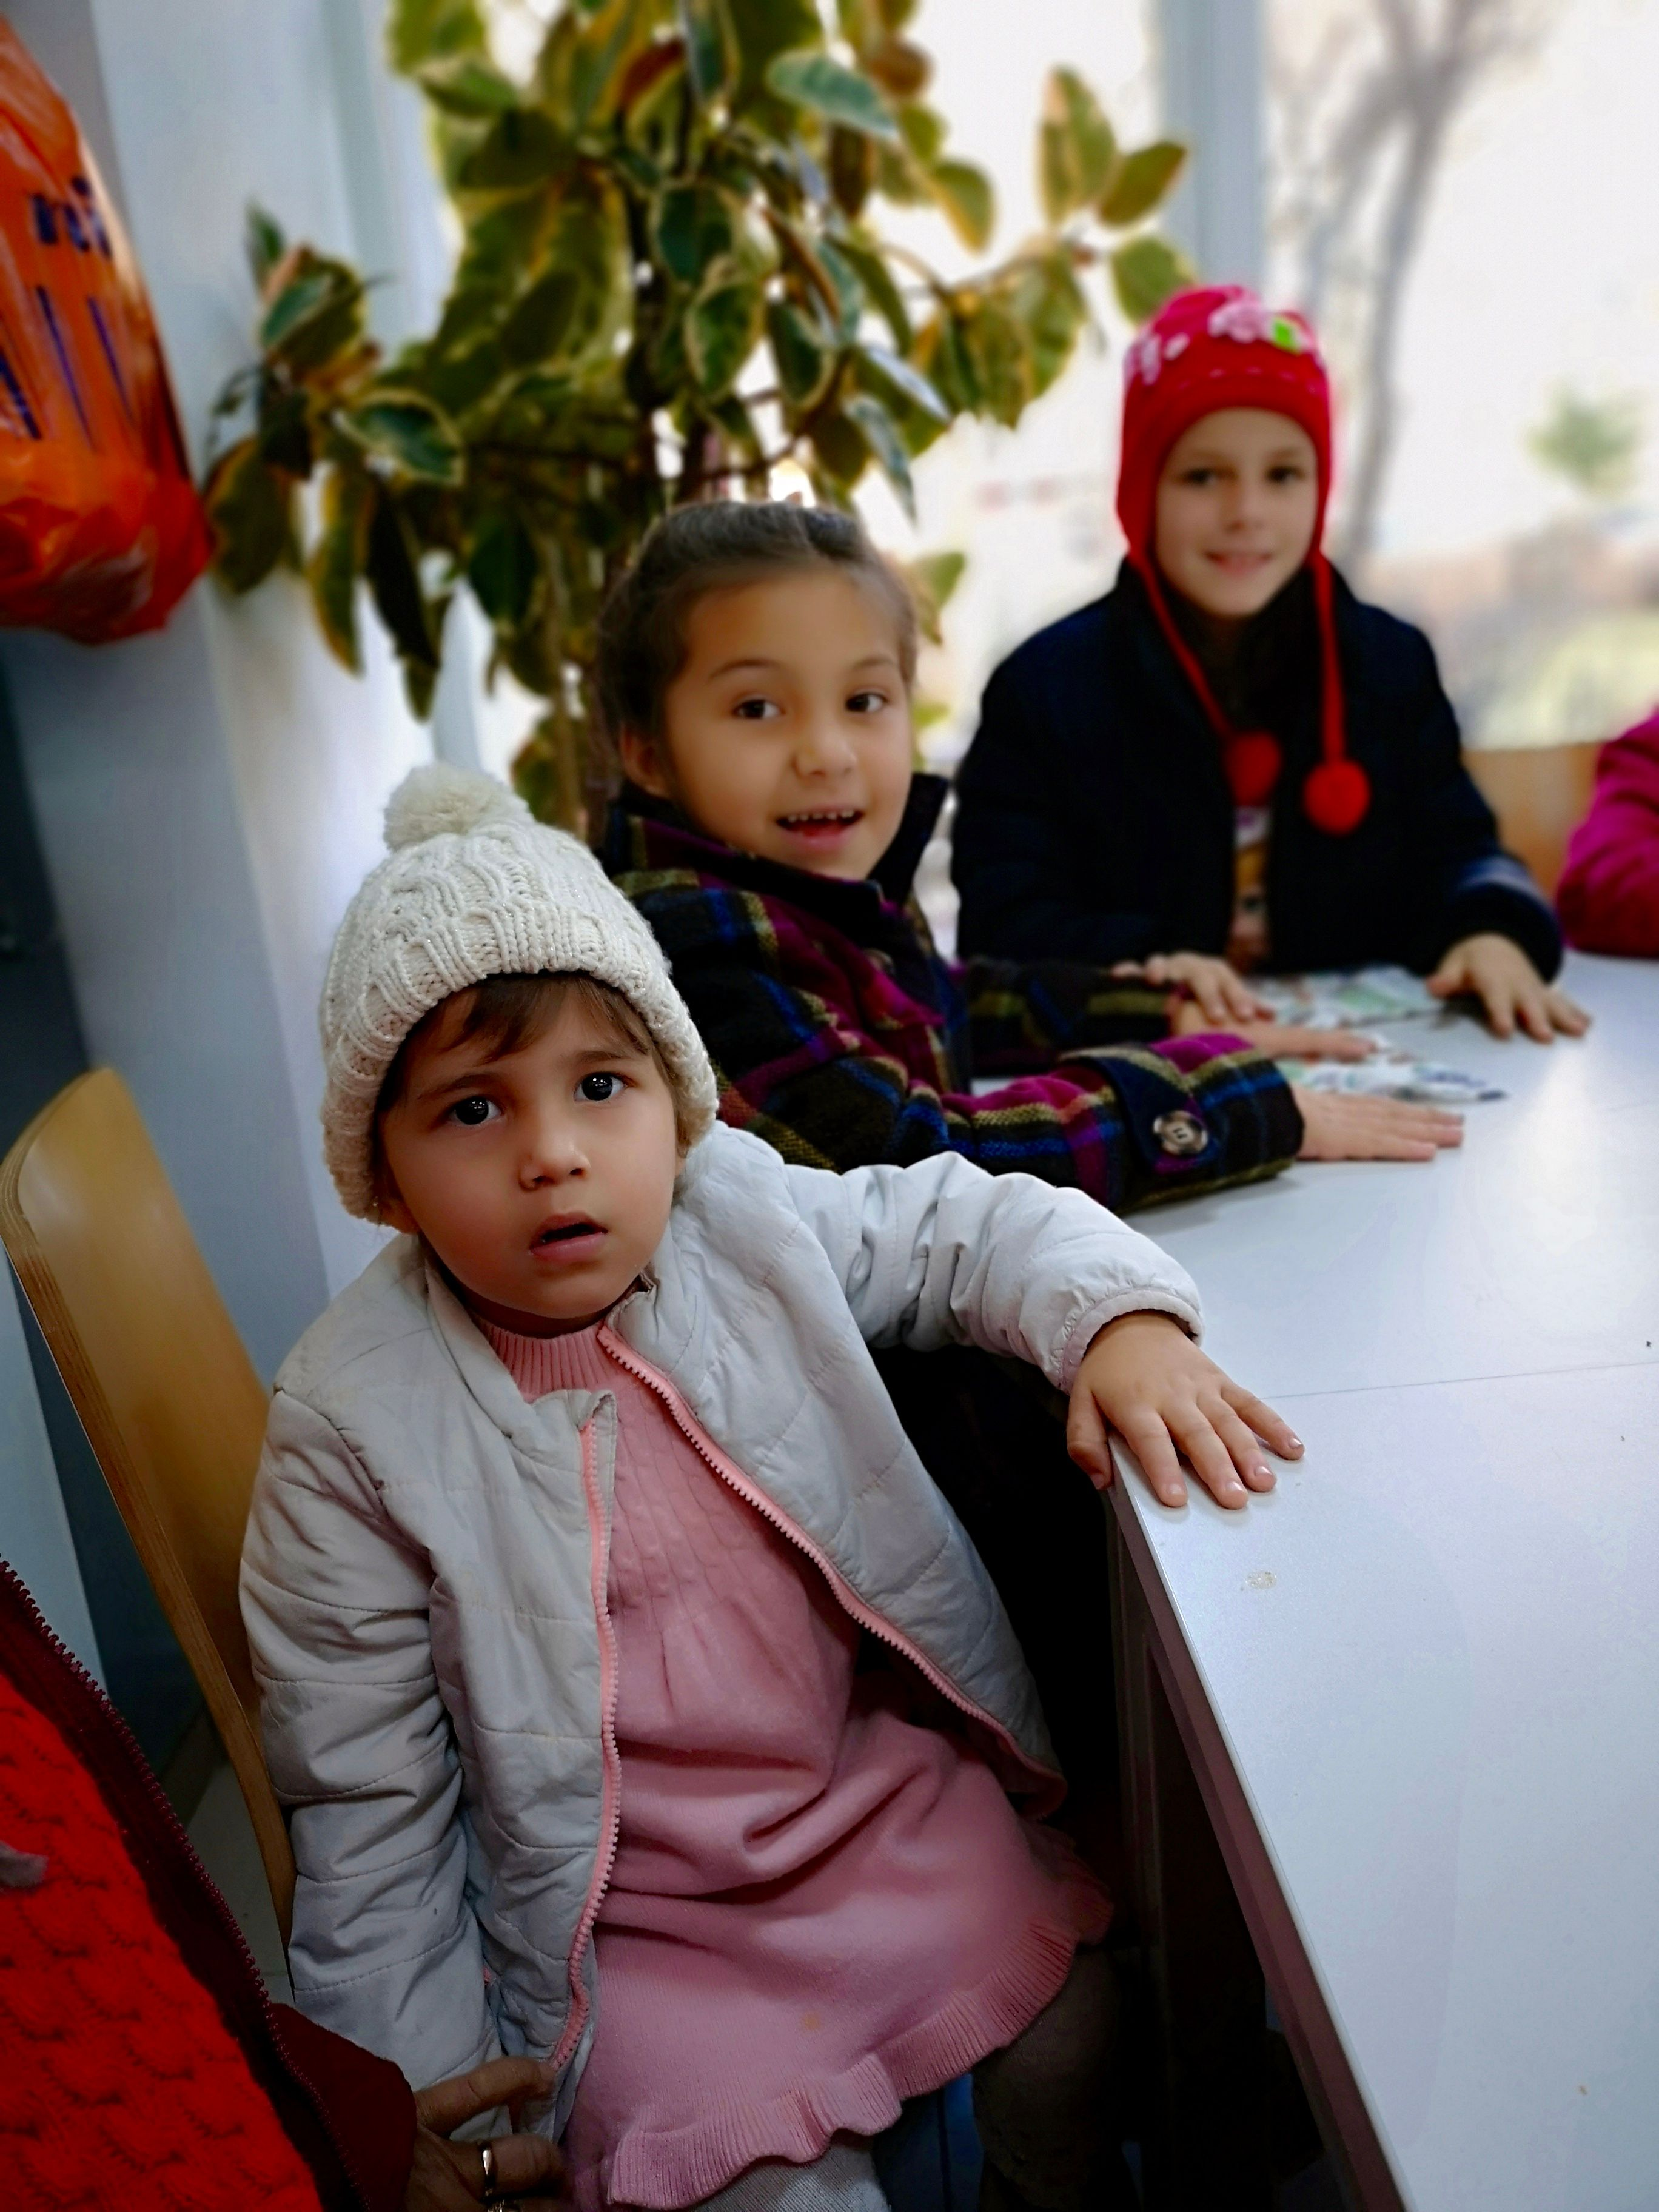 Romania's Children